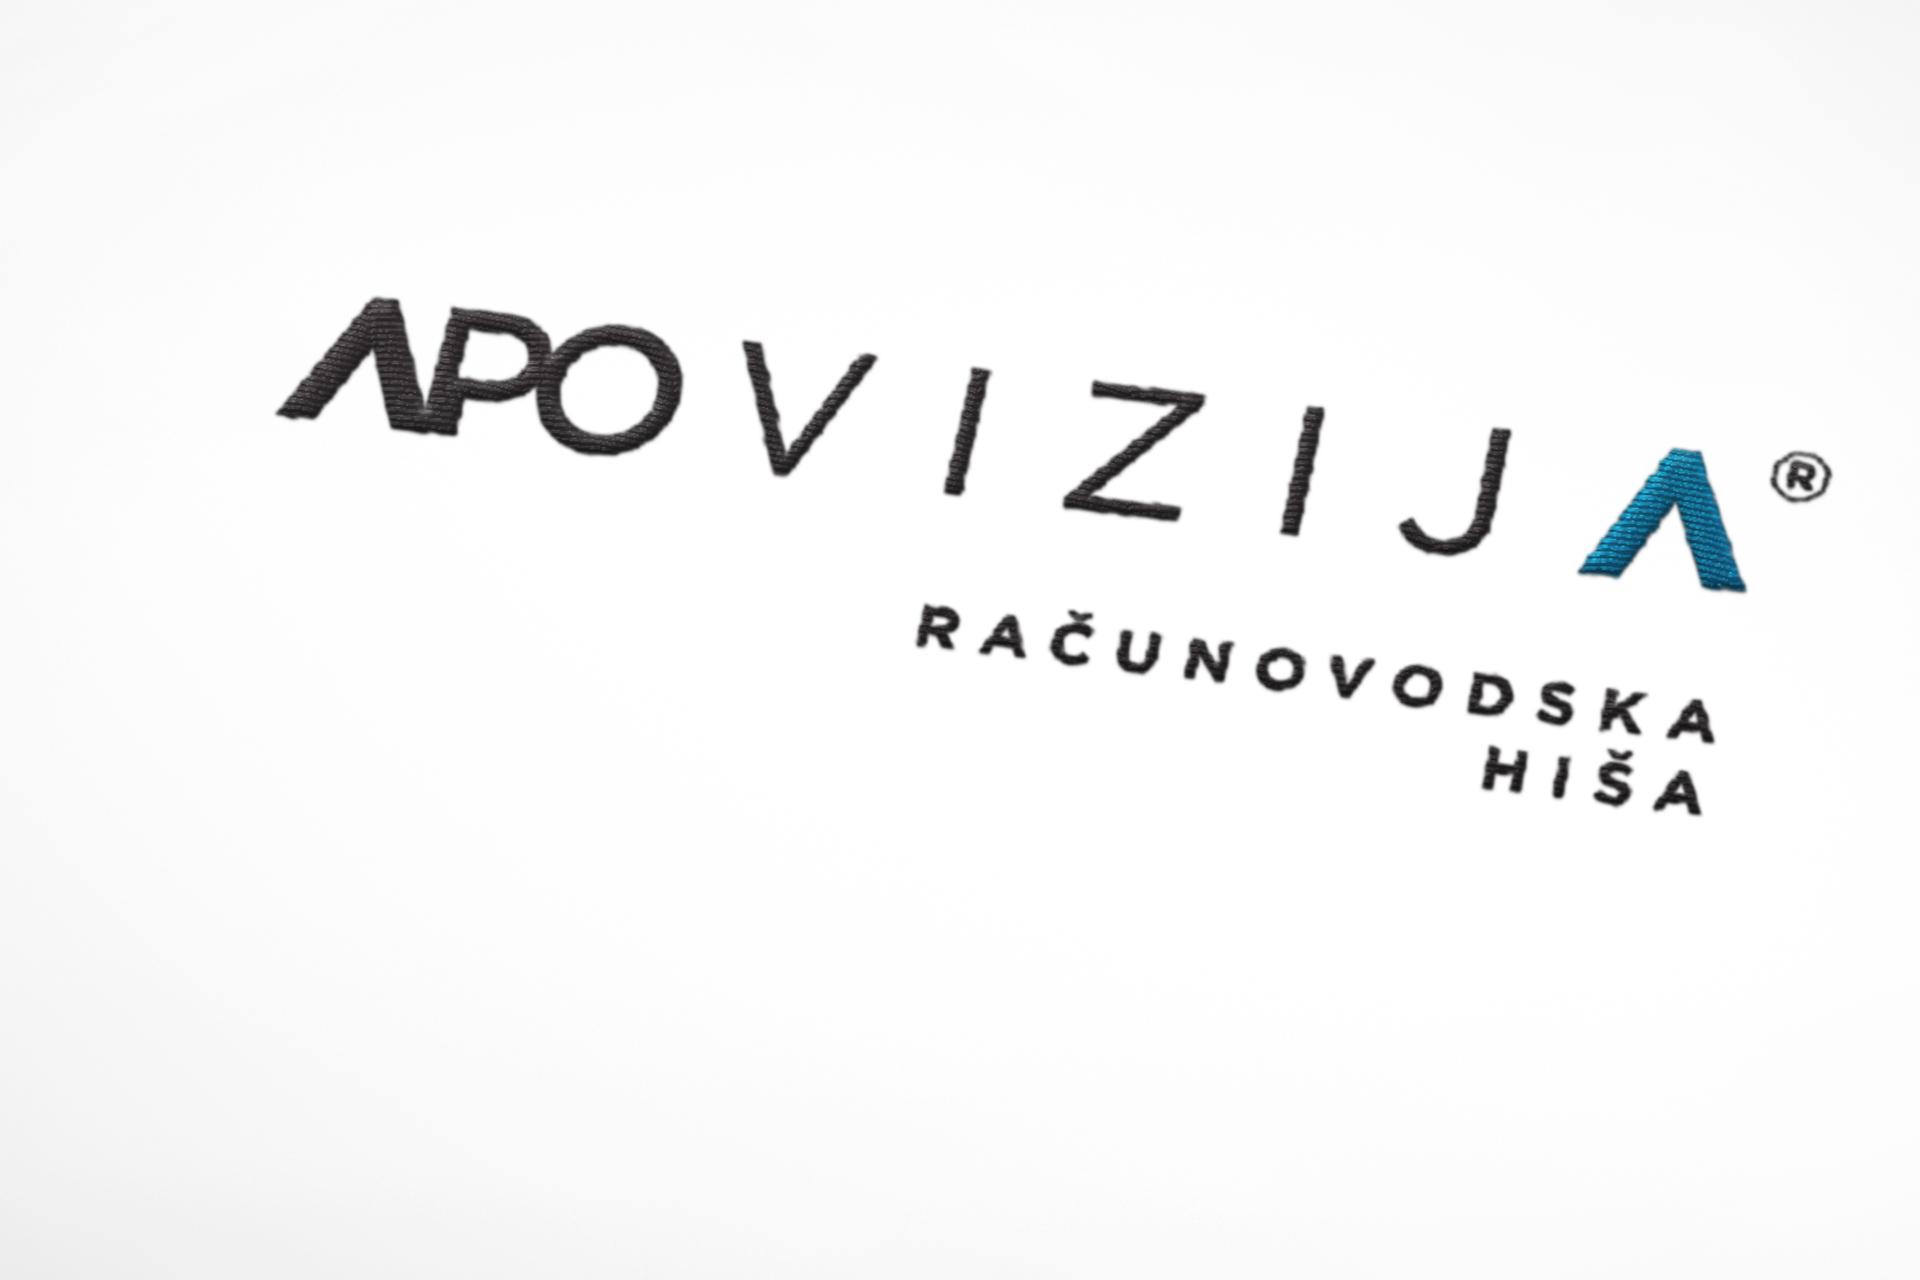 apo_vizija_logo_embroided_ma-ma_marinsek_2